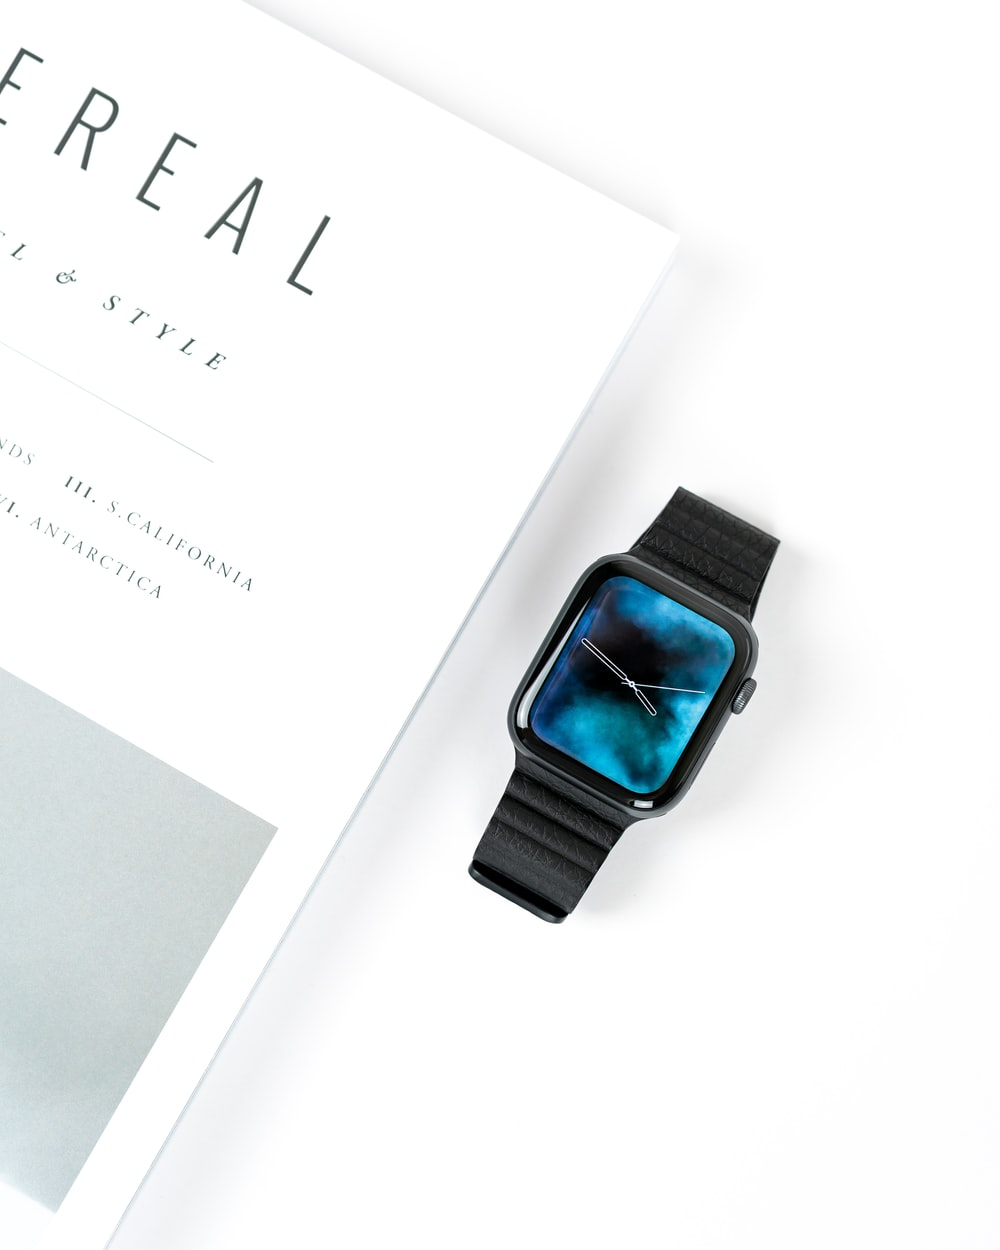 black smart watch beside white book